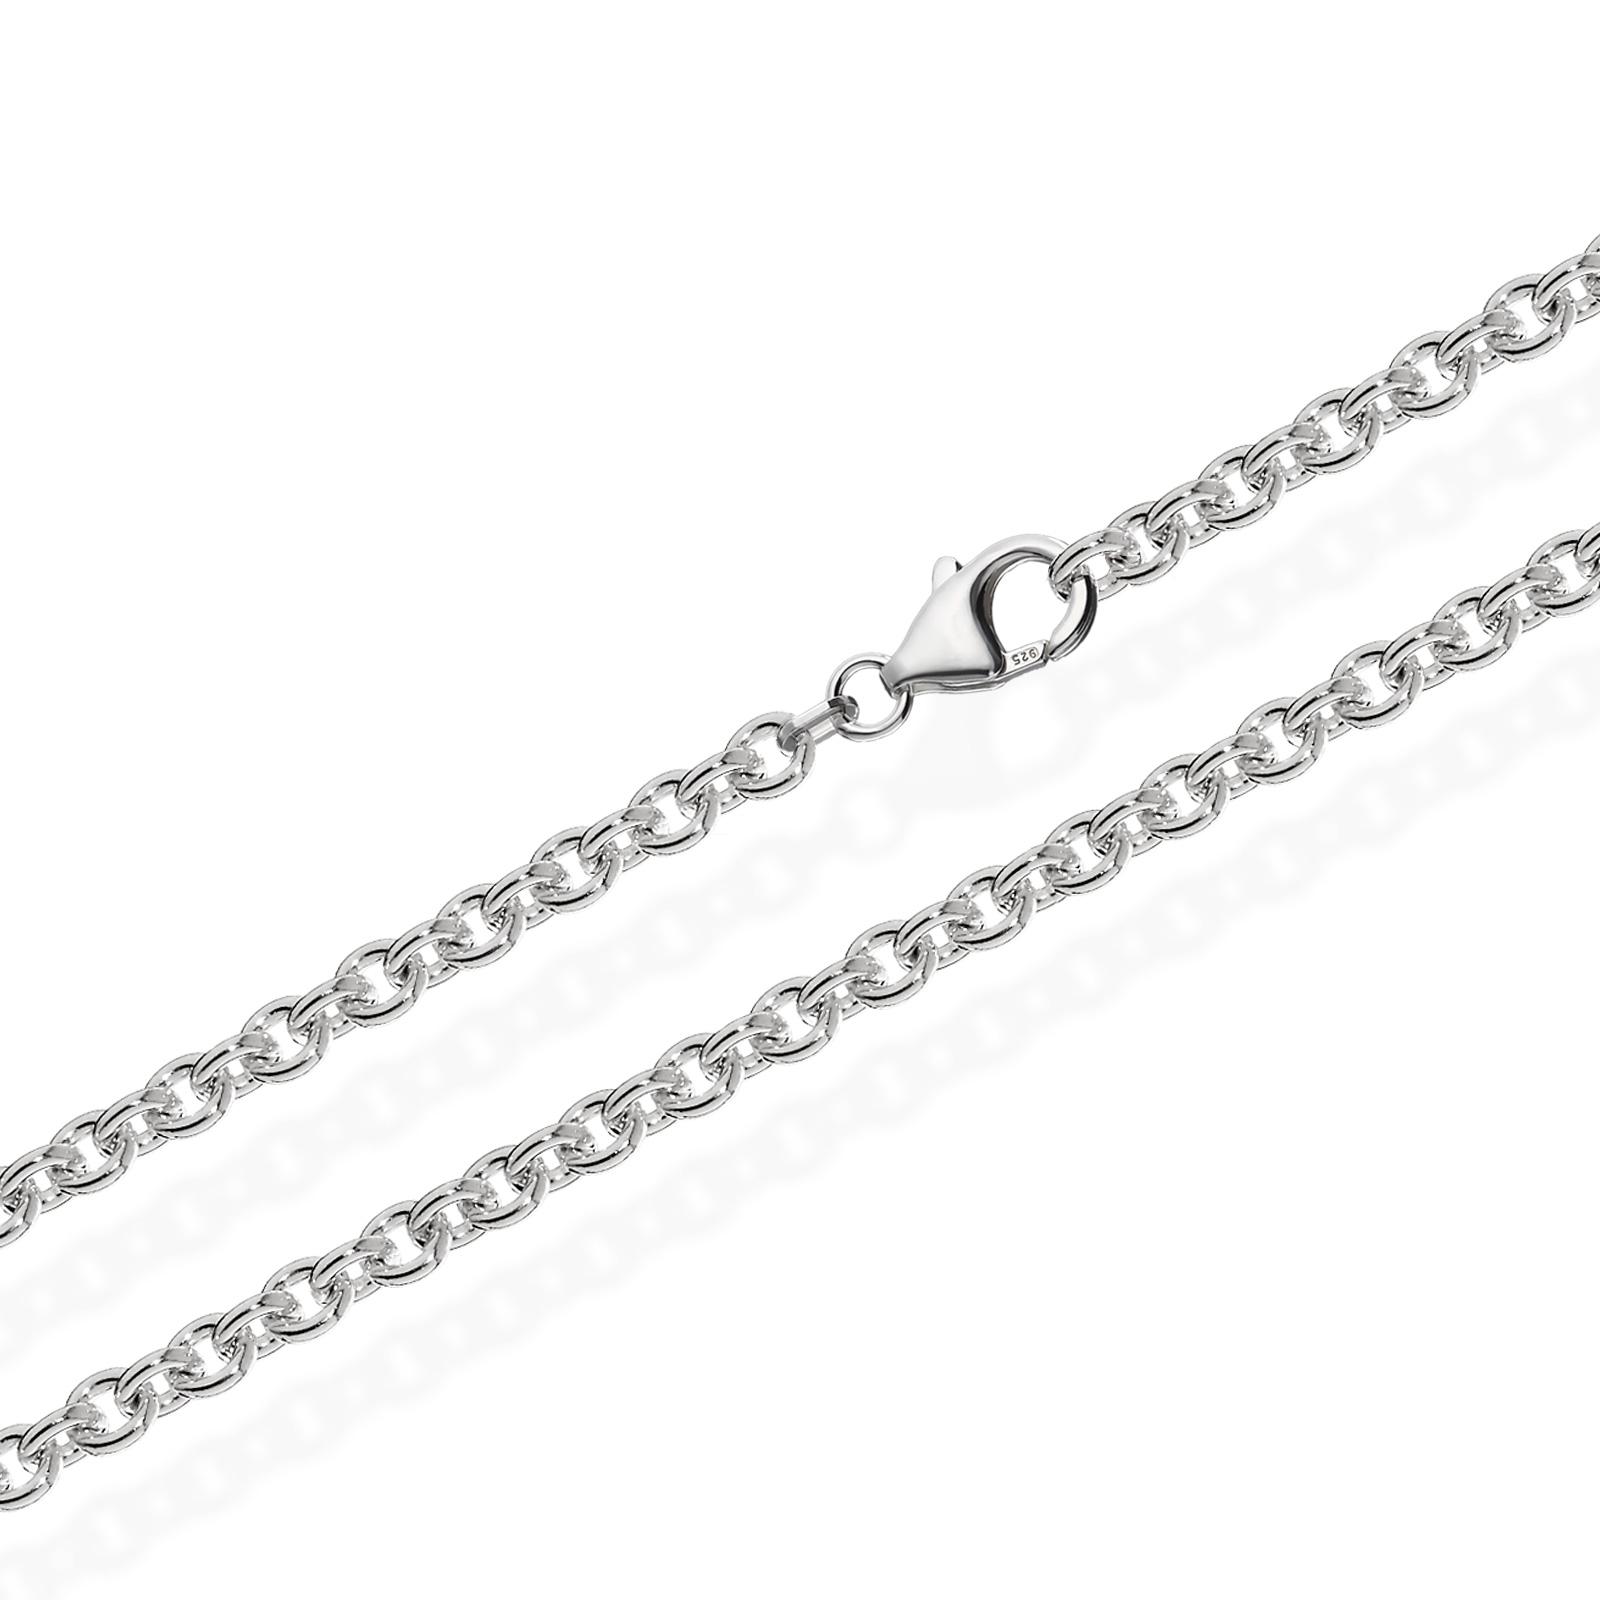 Ankerkette Rund 925 Sterling Silber Kette Massiv Halskette